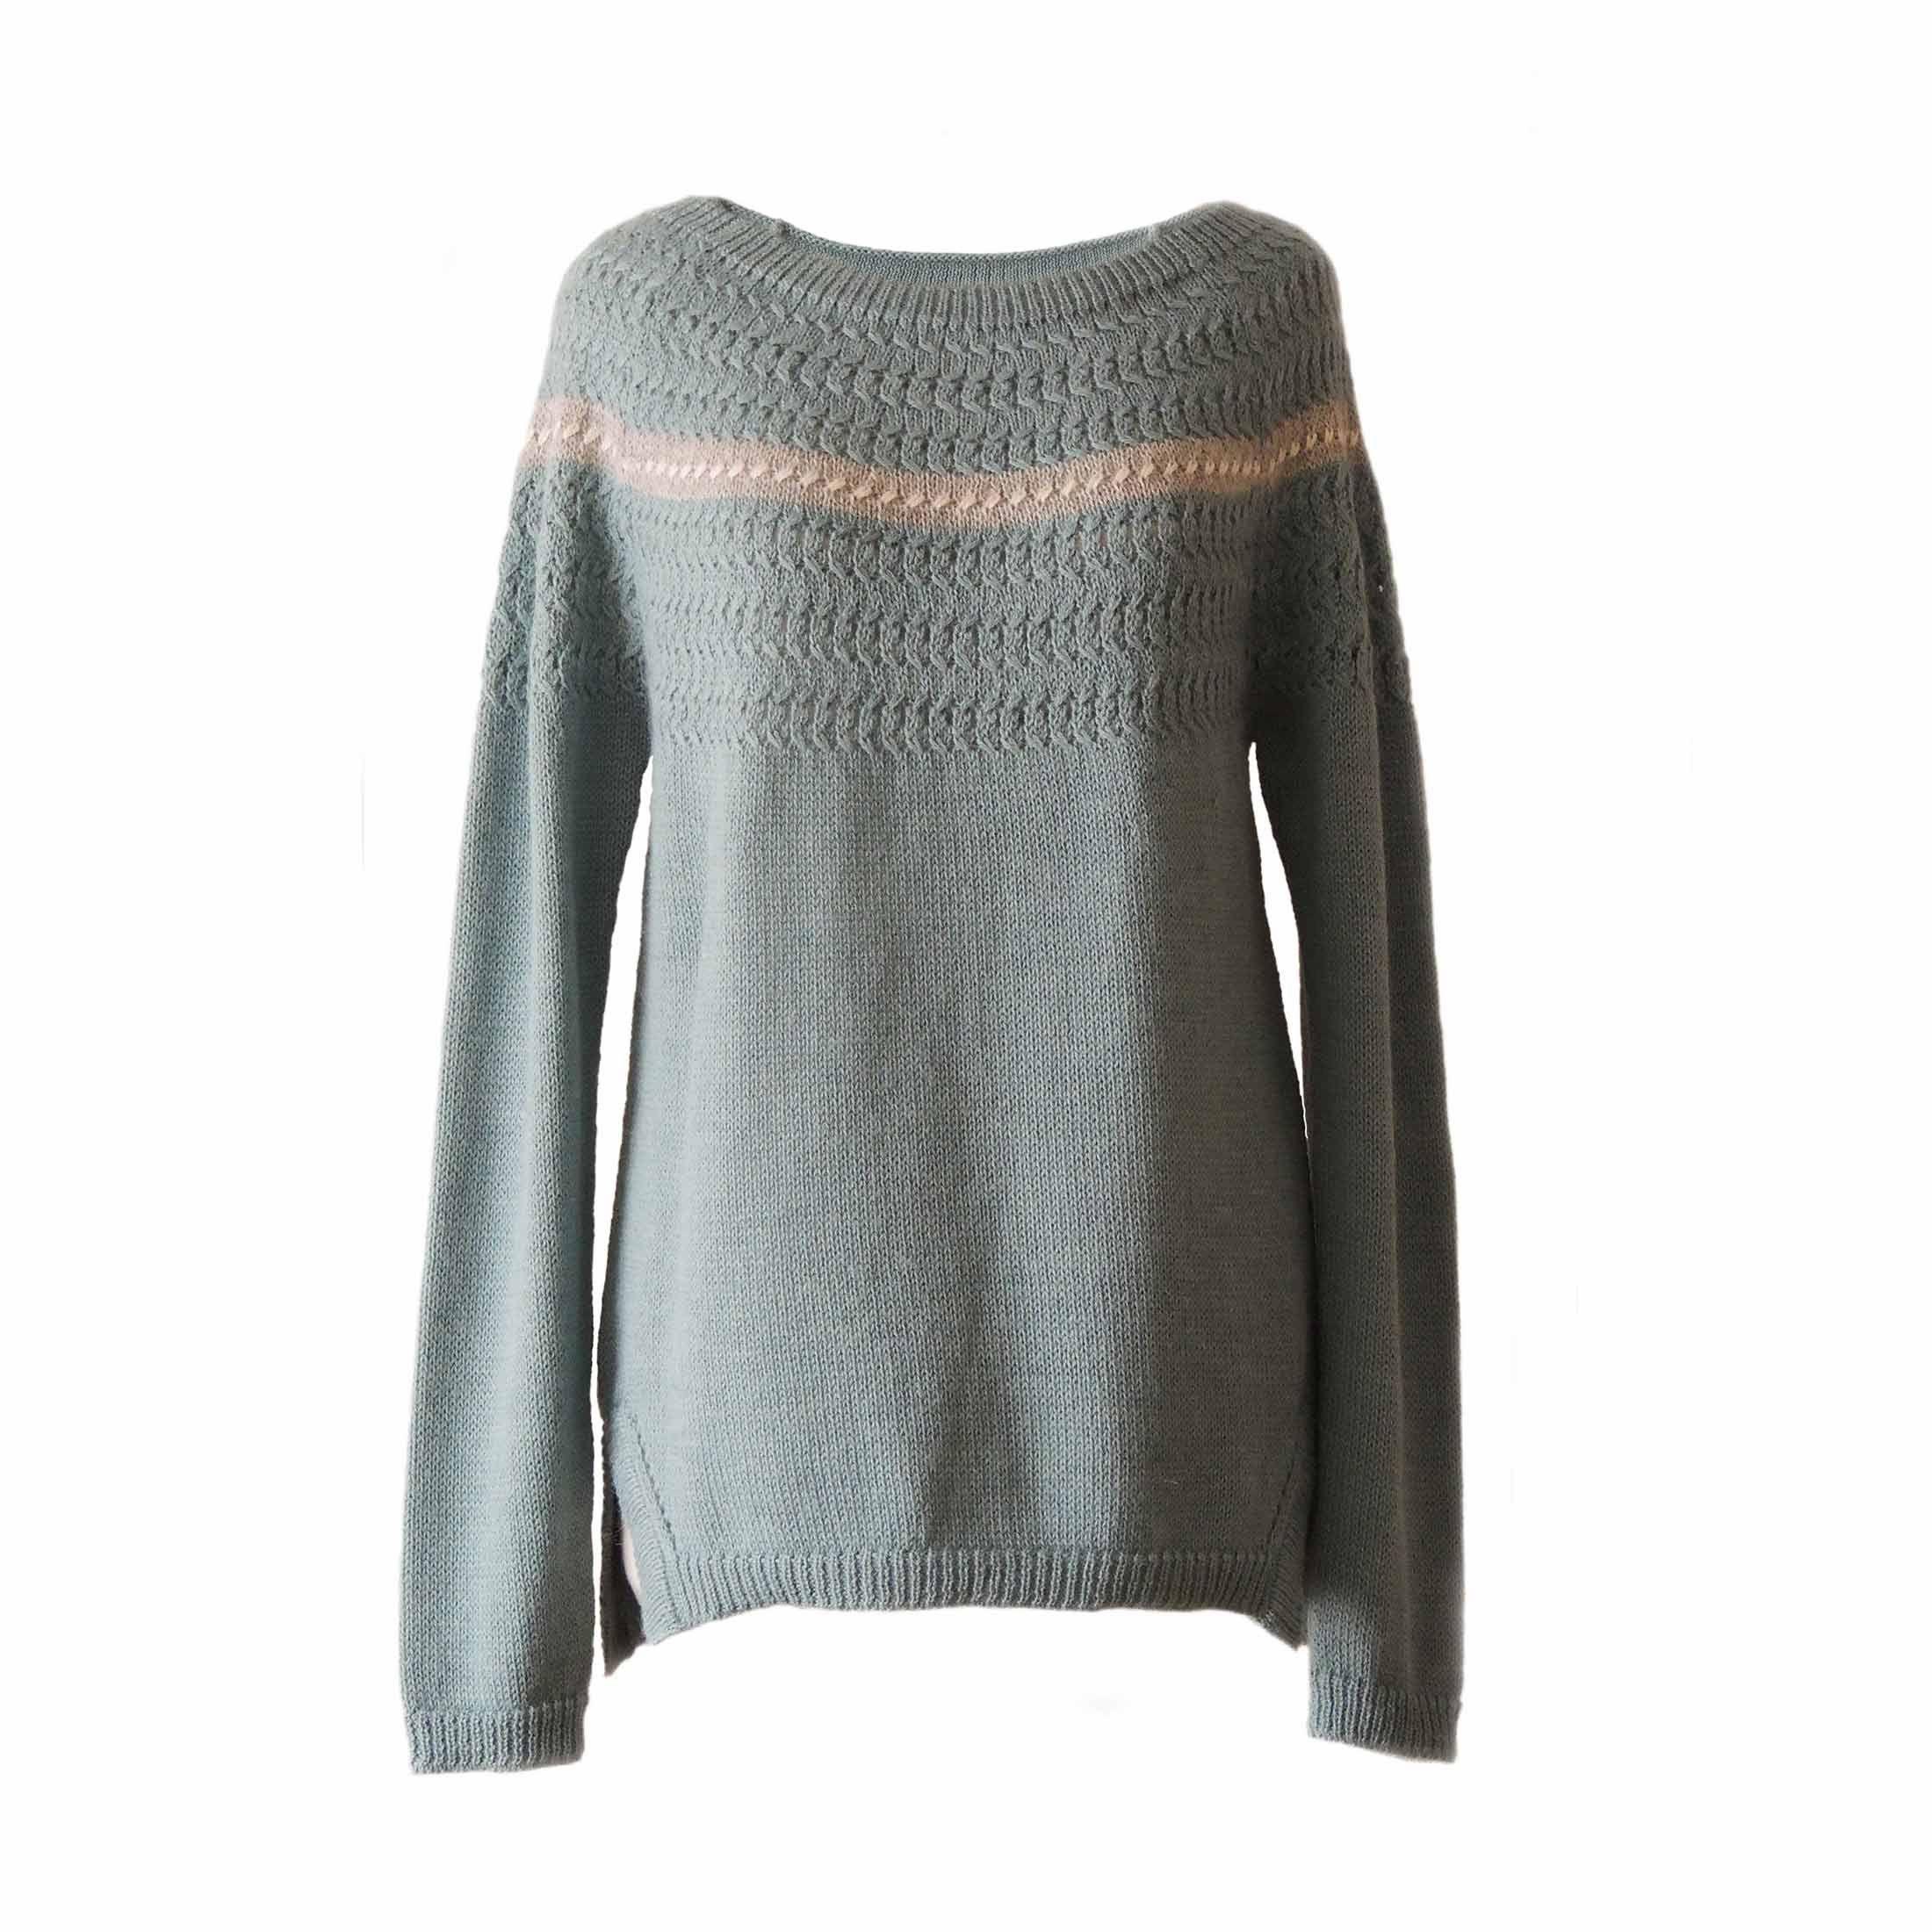 Women S Sweater 100 Baby Alpaca Knitted Baby Alpaca Etsy Sweaters For Women Women Pullover Baby Alpaca Knit